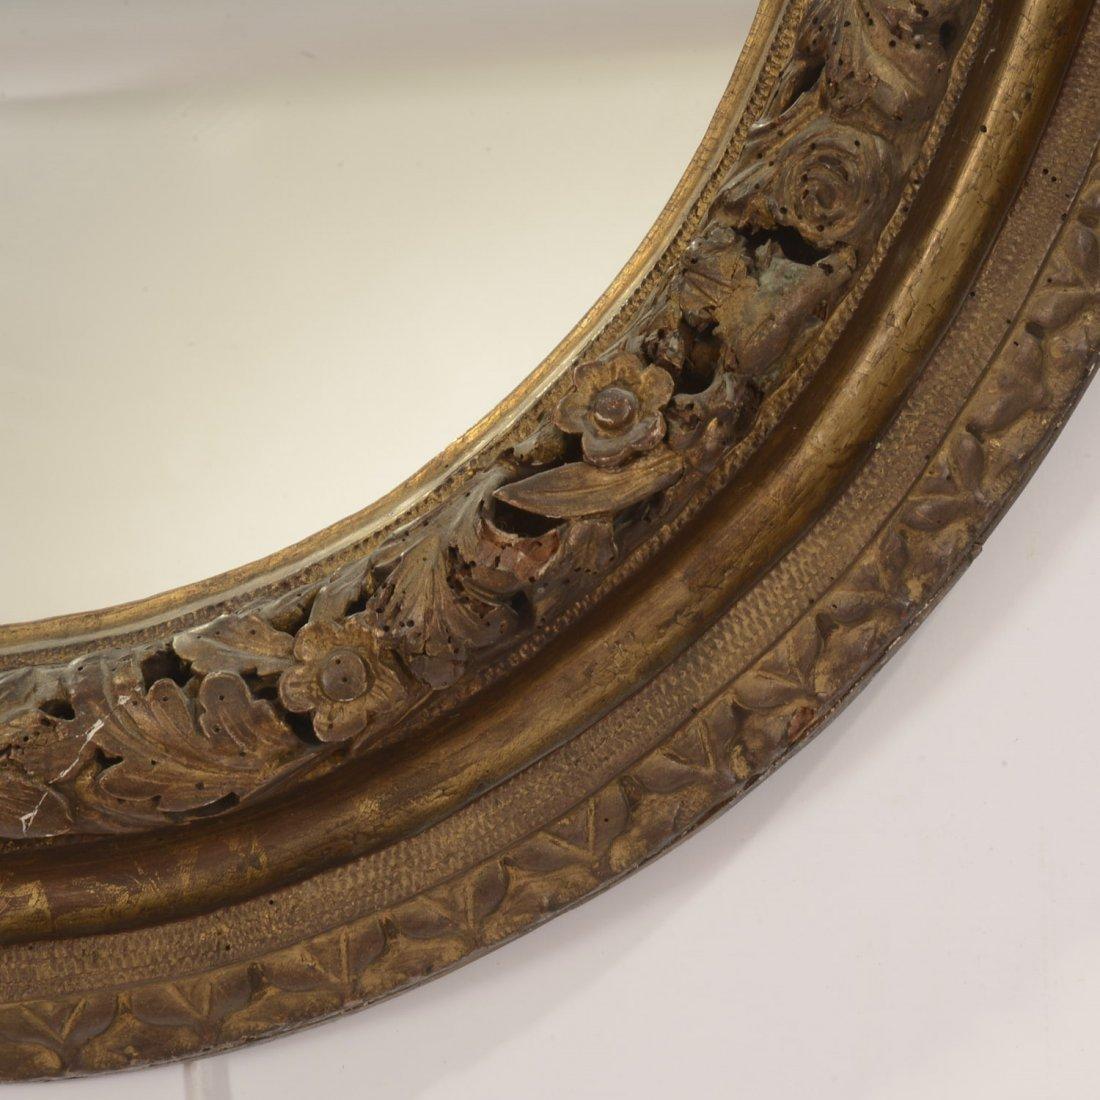 Continental Rococo giltwood oval wall mirror - 6